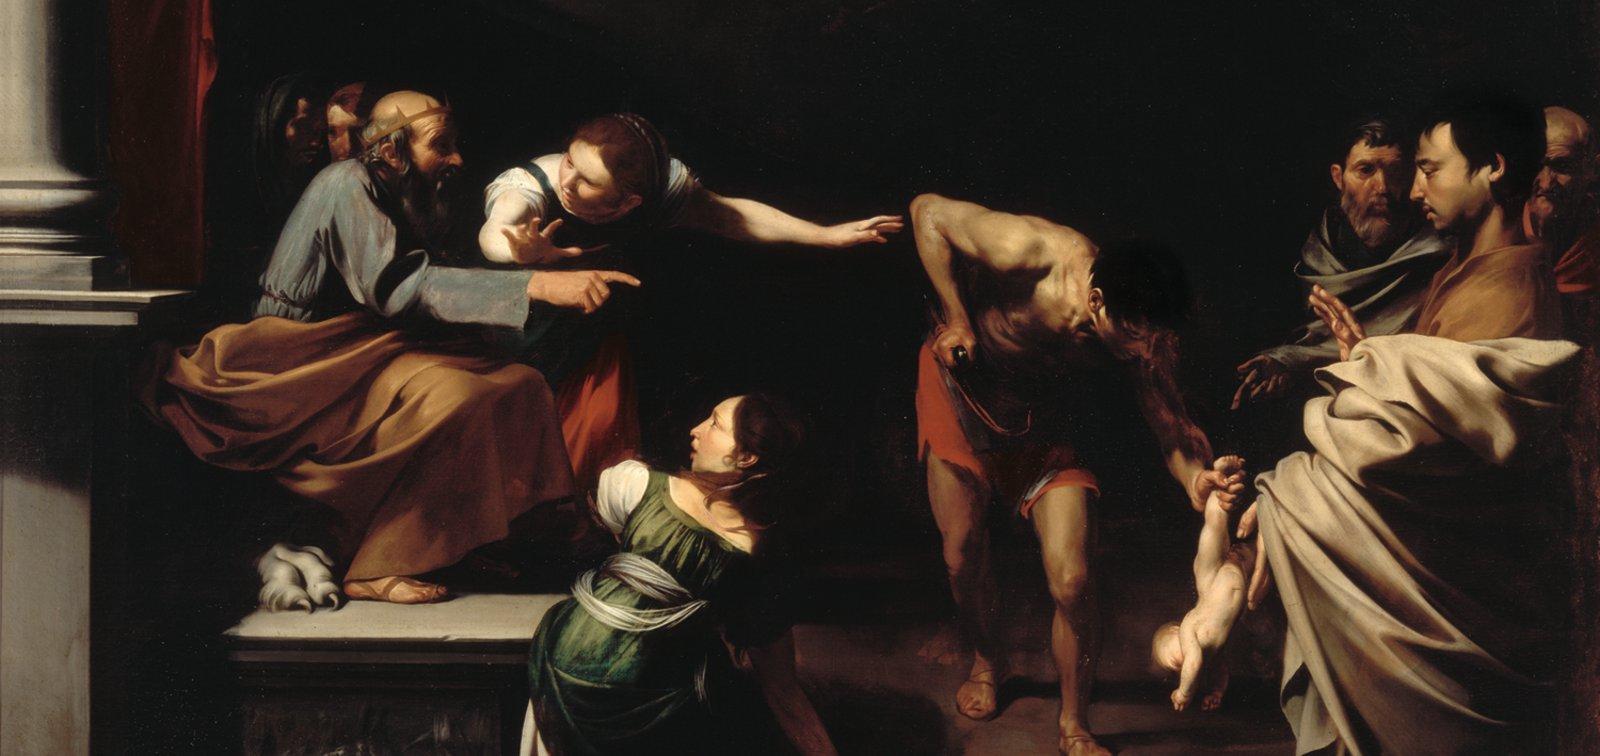 The Young Ribera